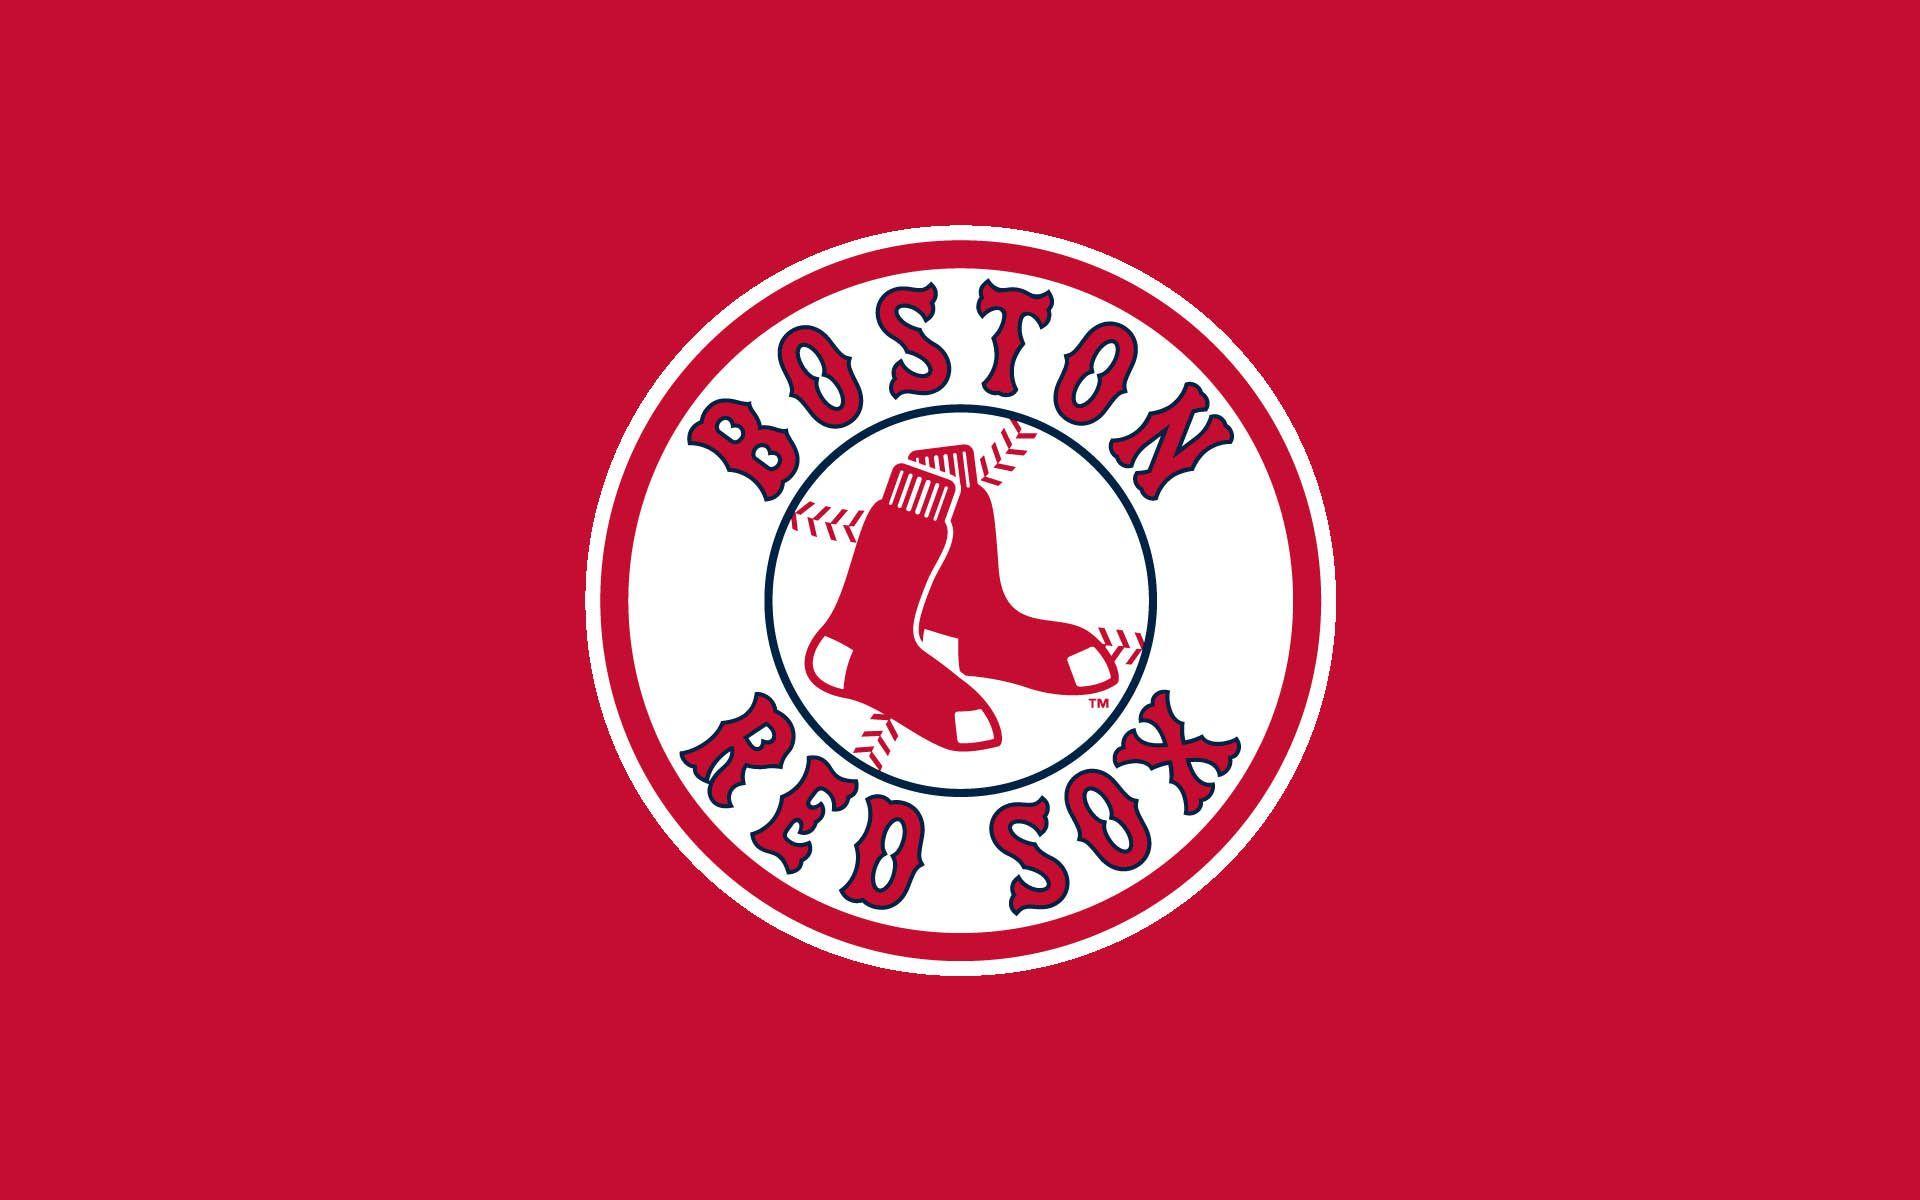 Boston red sox logo wallpapers wallpaper wallpapers pinterest mlb boston red sox logo baseball stadium wallpaper hd in red sox logo wallpapers wallpapers voltagebd Images